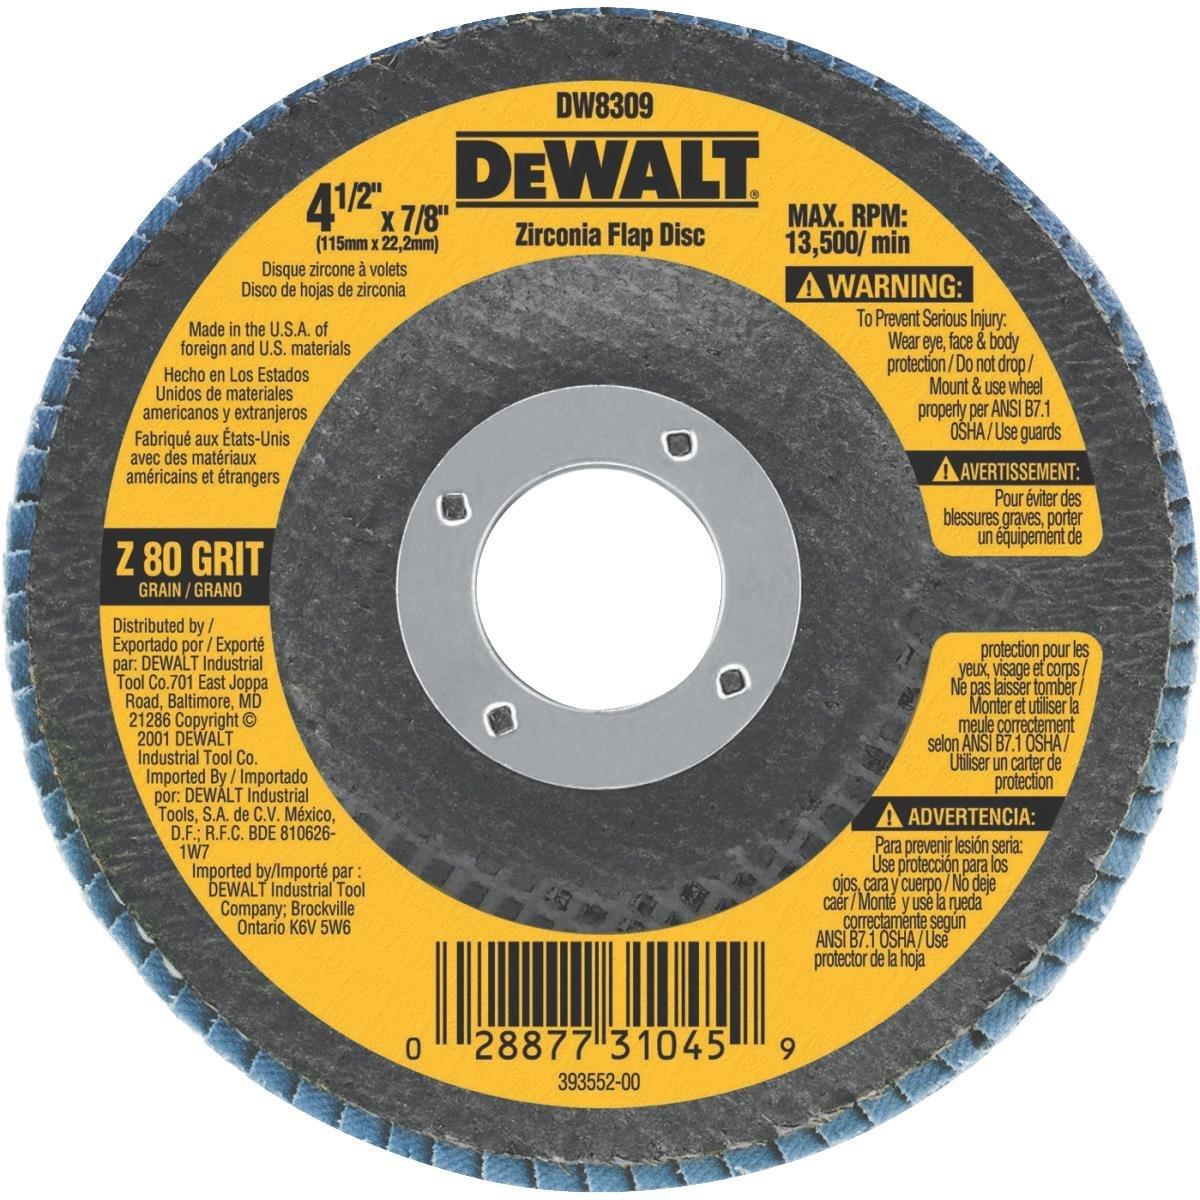 DEWALT Flap Disc, Zirconia, 4-1/2-Inch x 7/8-Inch, 80-Grit (DW8309), $3.49, Amazon